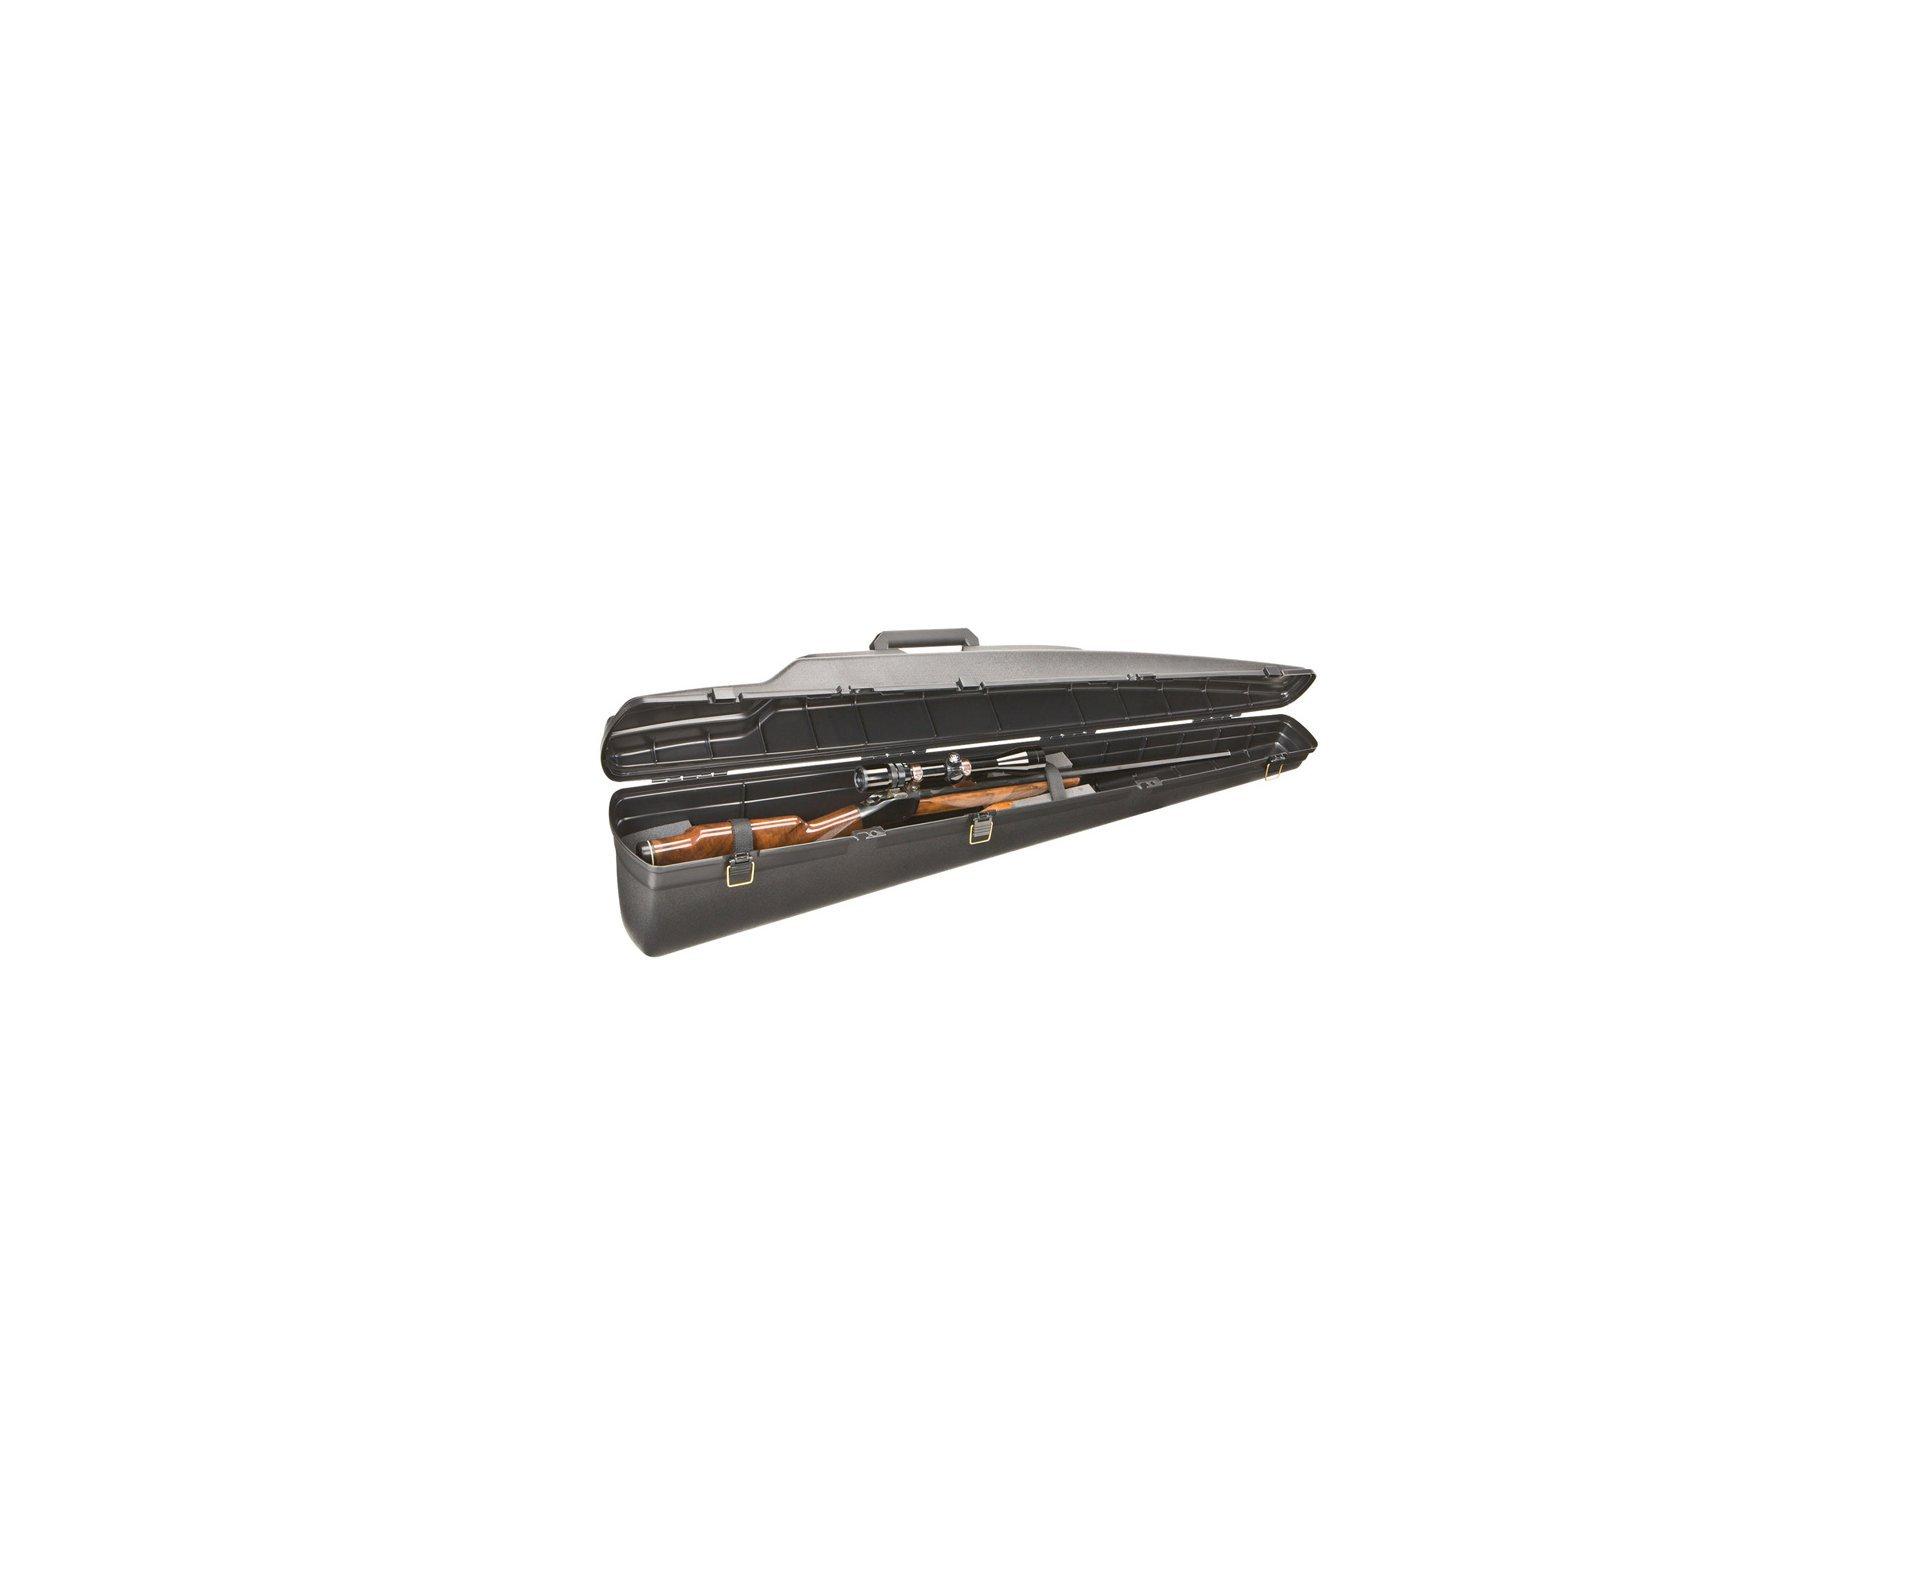 Caixa (case) Plano Para Arma Longa (1301-02) - Airglide